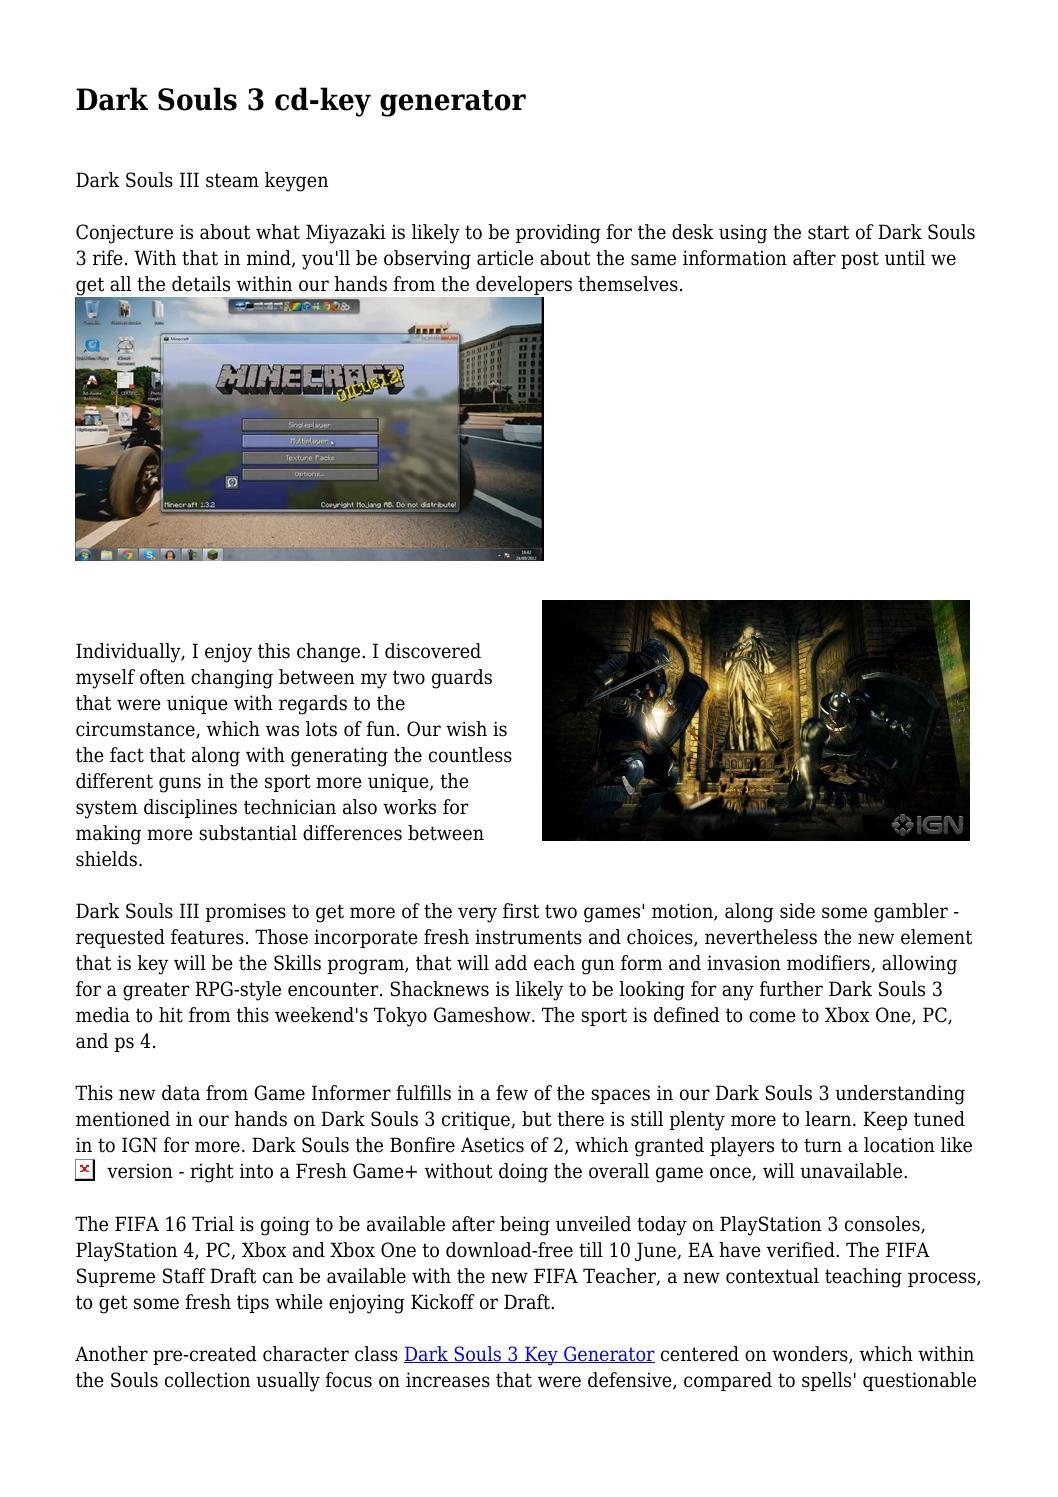 Dark Souls 3 cd-key generator by aterylap156270 - issuu